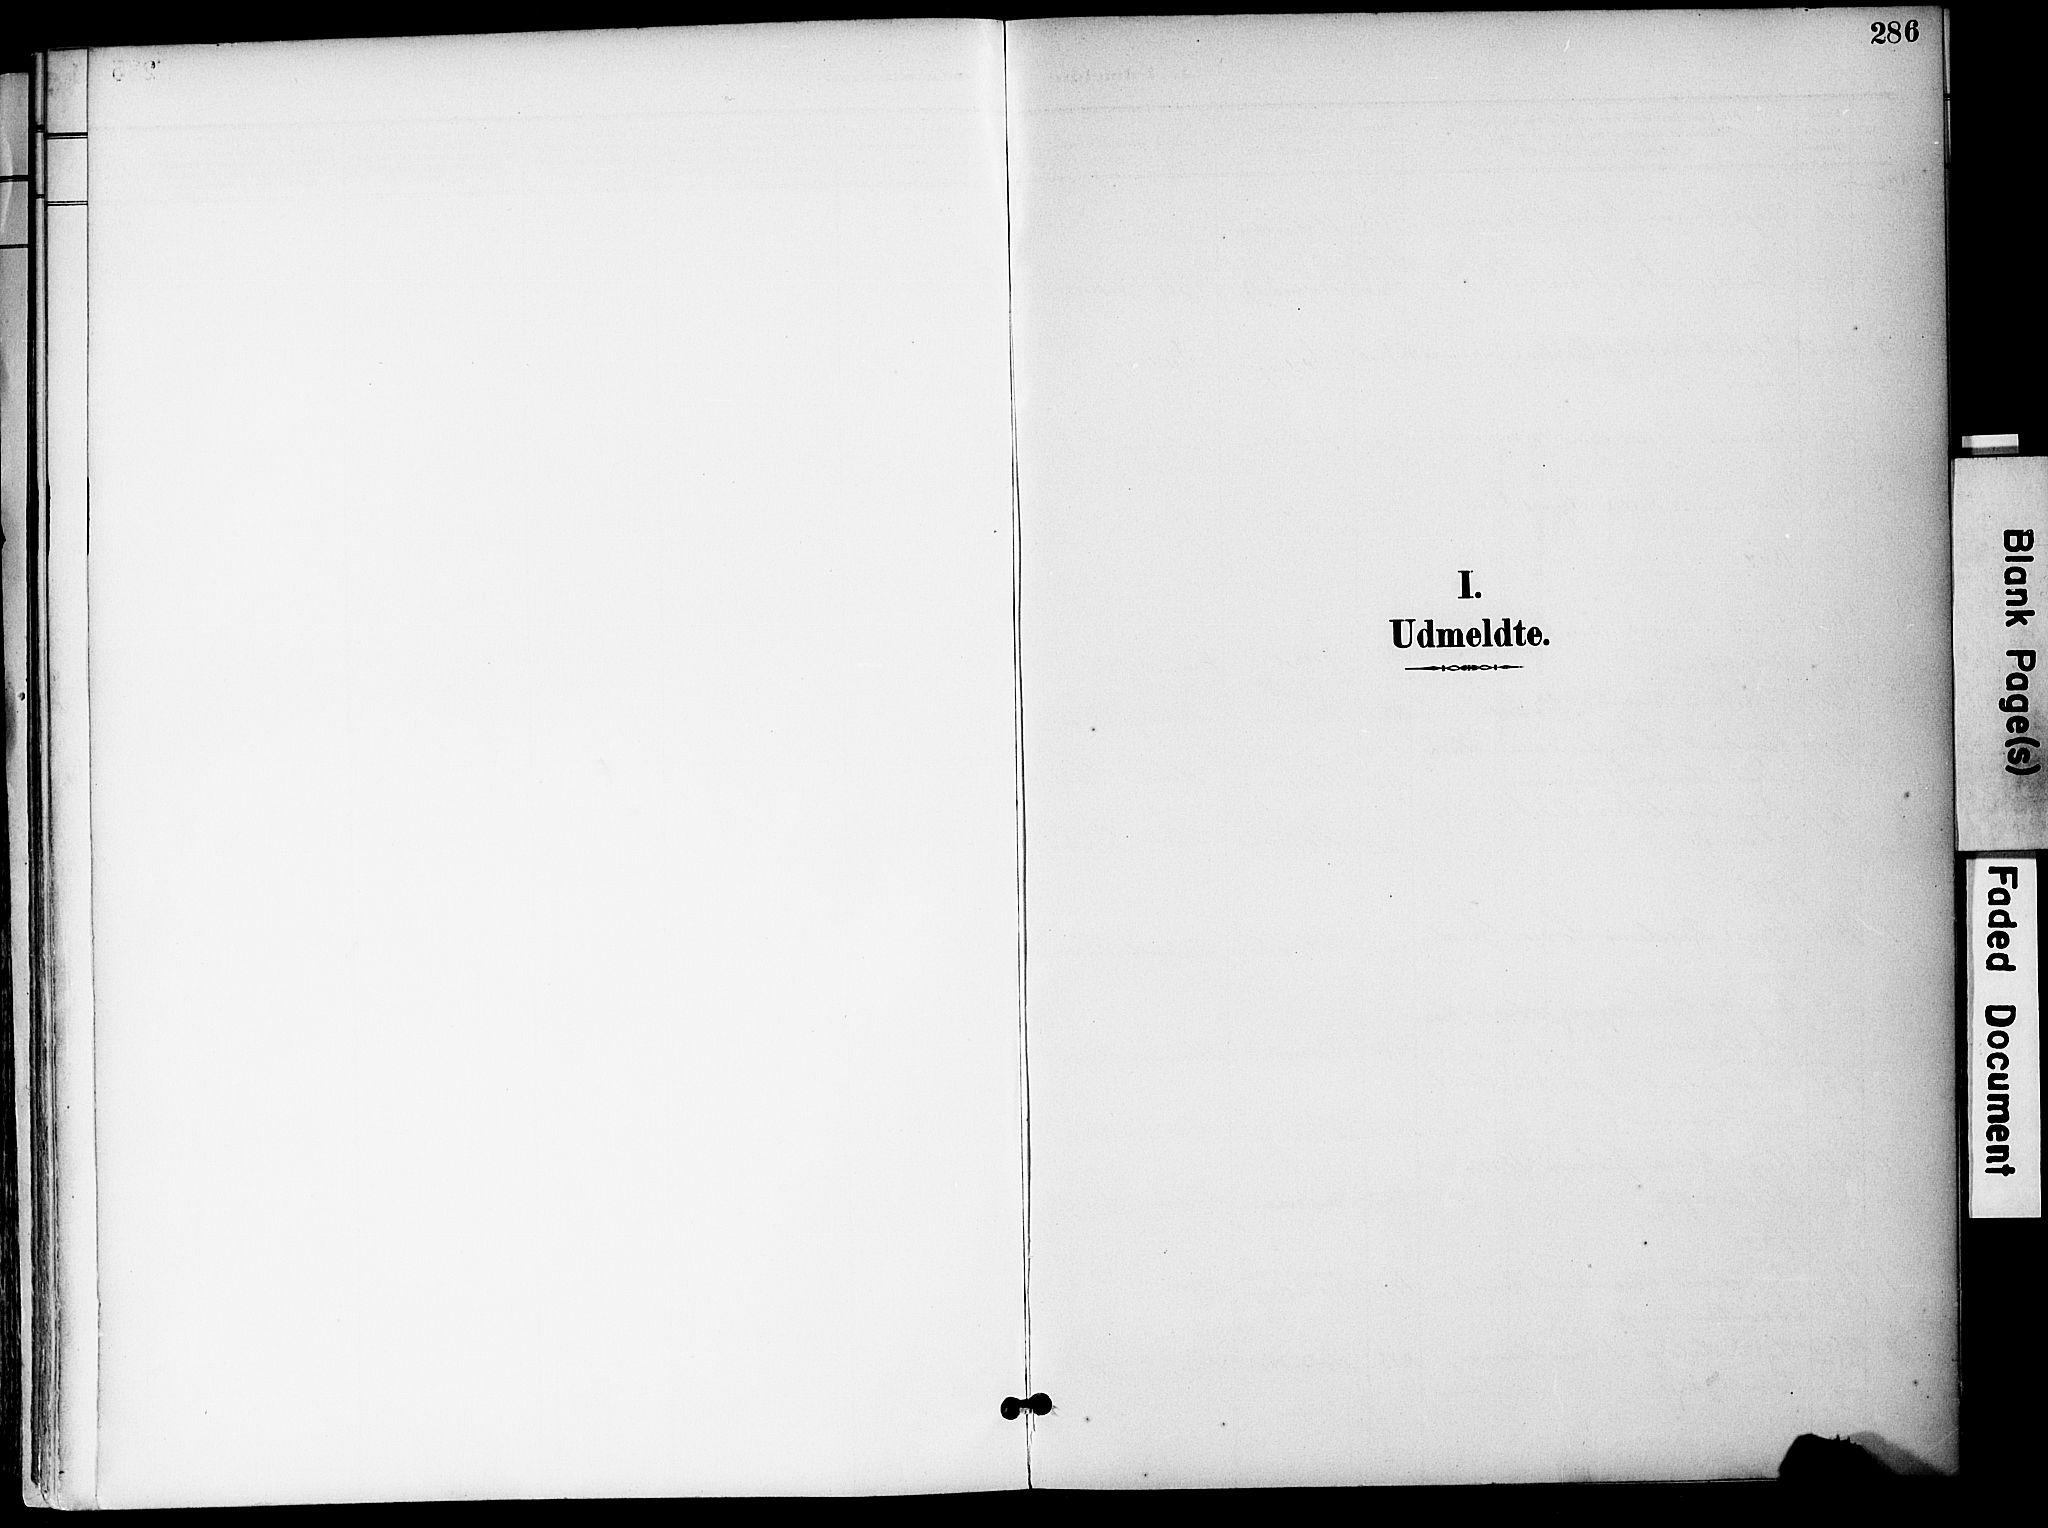 SAKO, Hurum kirkebøker, F/Fa/L0015: Ministerialbok nr. 15, 1896-1908, s. 286